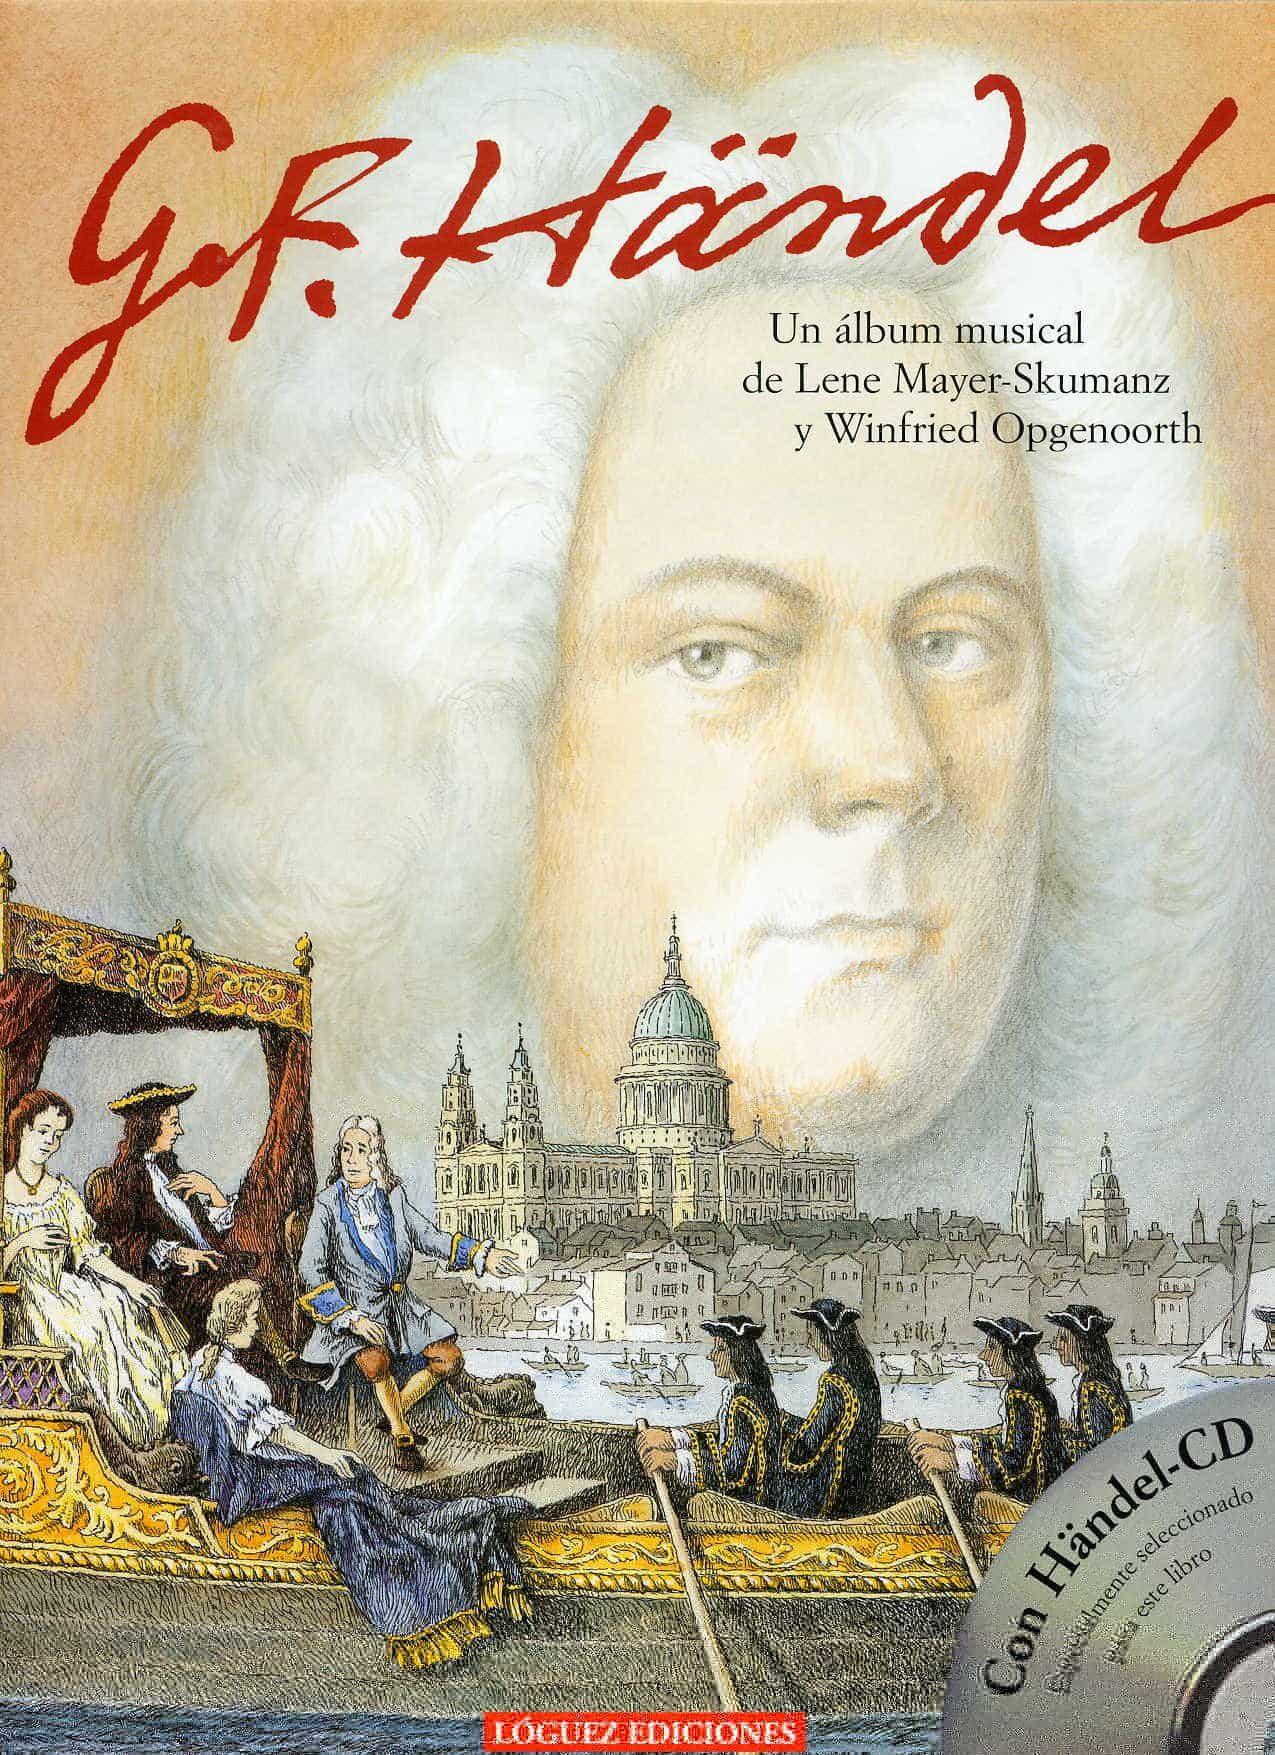 G.f. Handel (con Cd) - Mayer-skumanz Lene